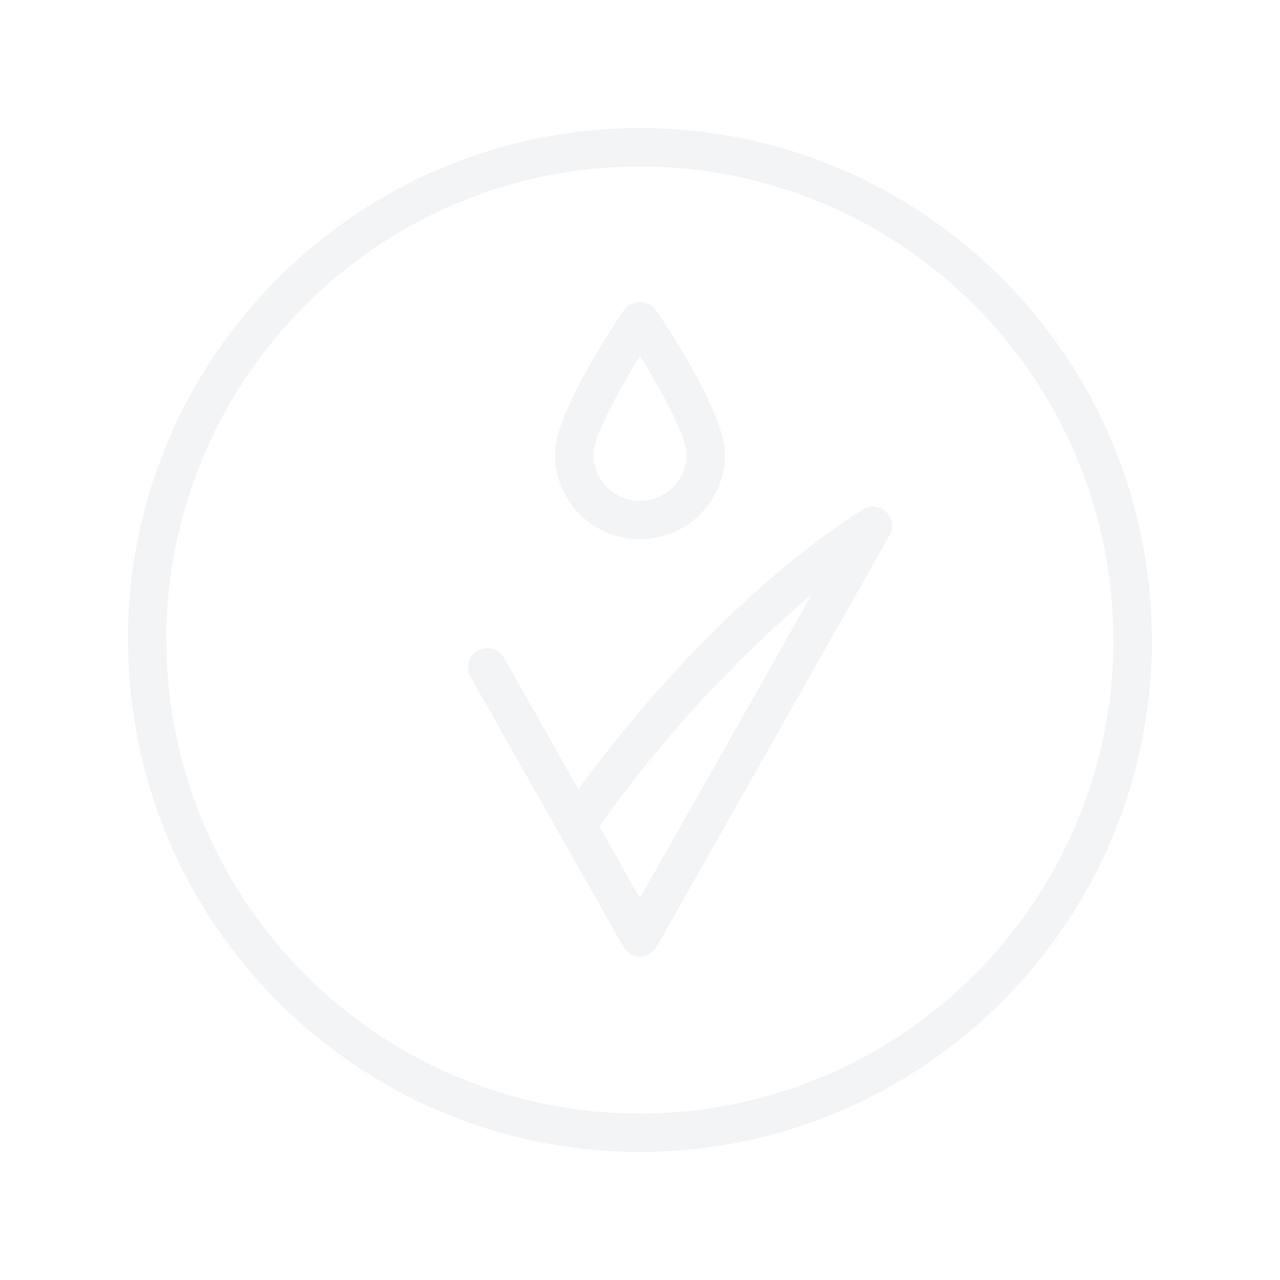 LA ROCHE-POSAY Anthelios Invisible Face Mist SPF50 солнцезащитный ультралегкий спрей для лица 75ml